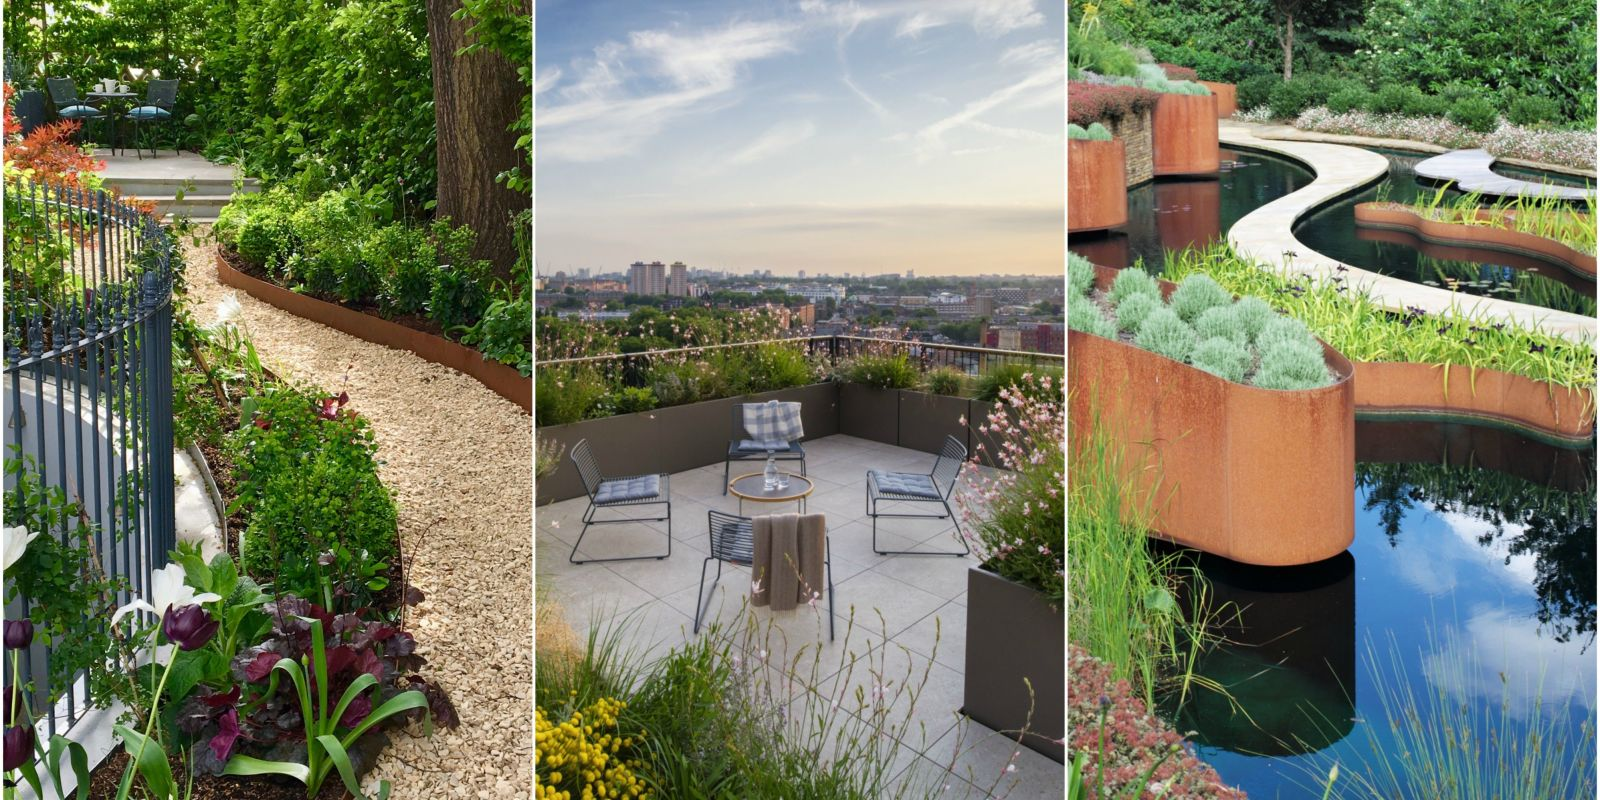 Garden design pictures winners of the society of garden for Garden idea ht 450